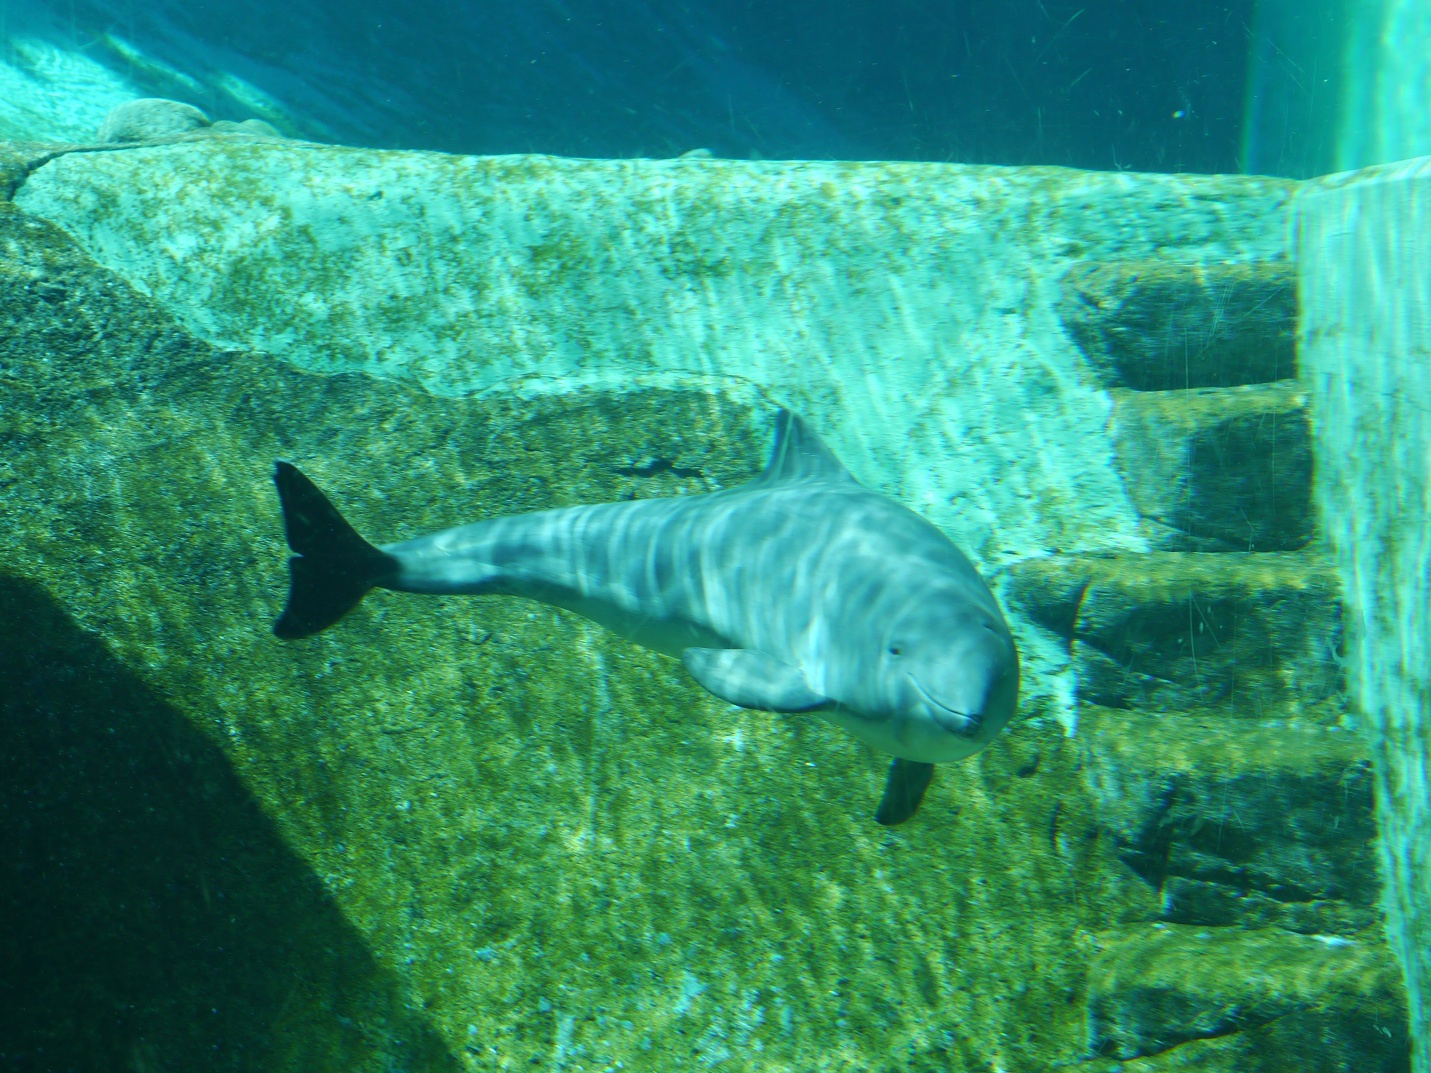 Fish aquarium vancouver - Hello River Porpoise